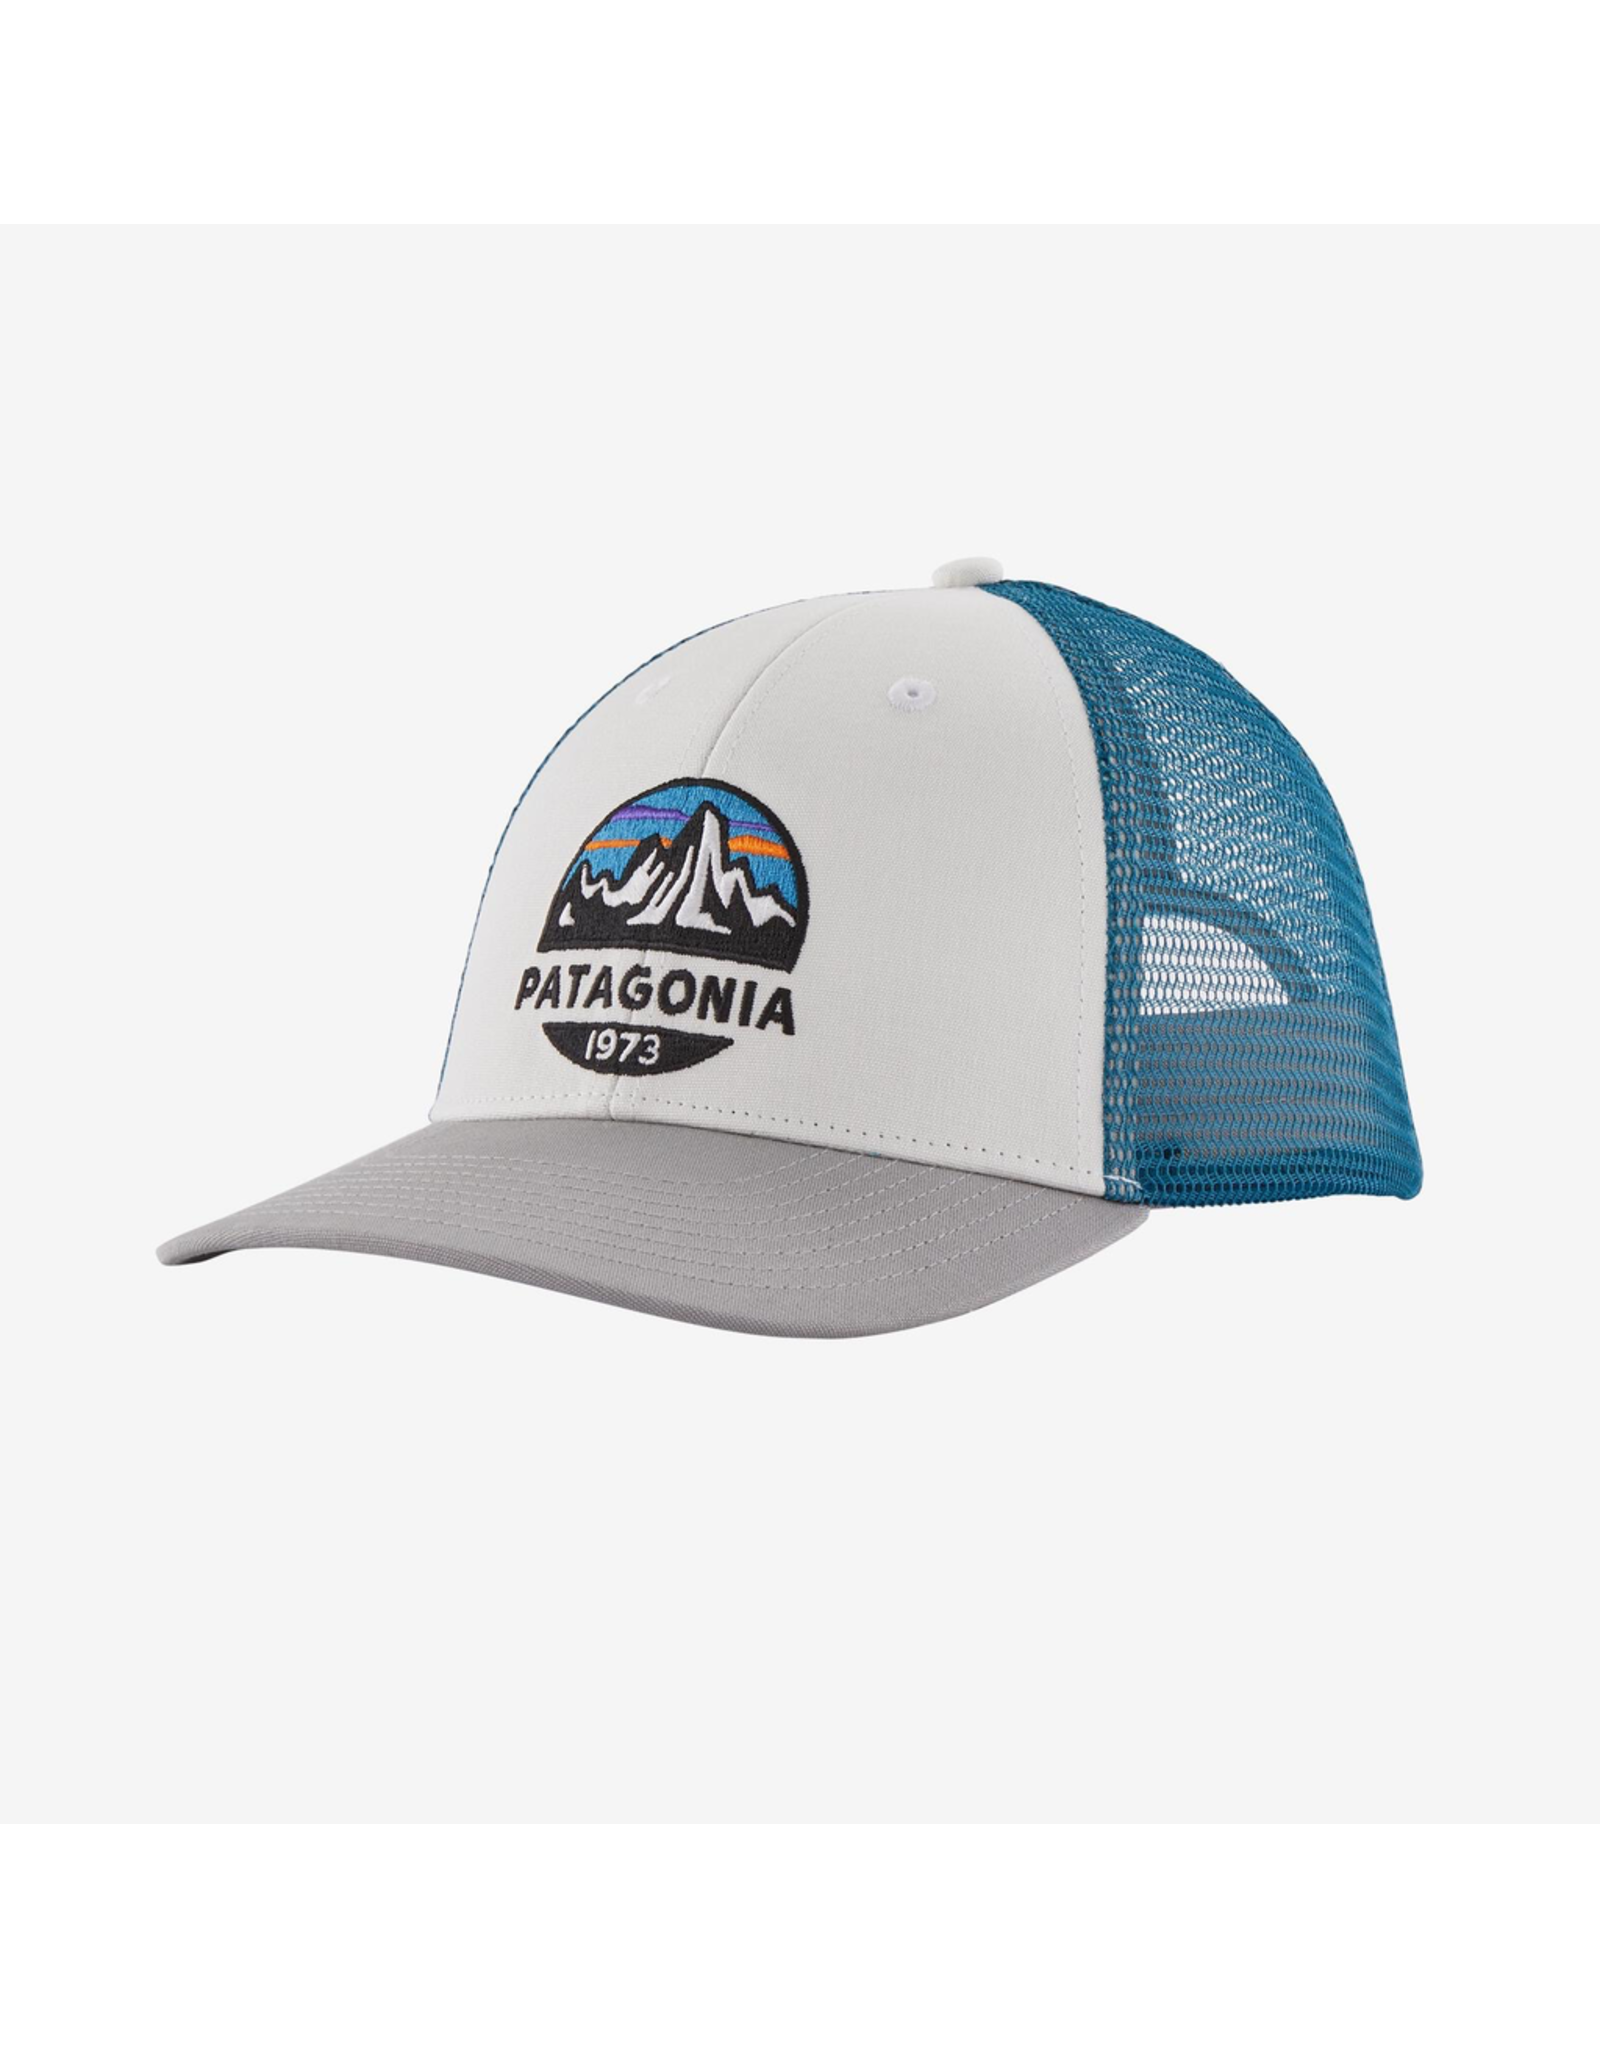 Patagonia Patagonia Fitz Roy Scope LoPro Trucker Hat - White